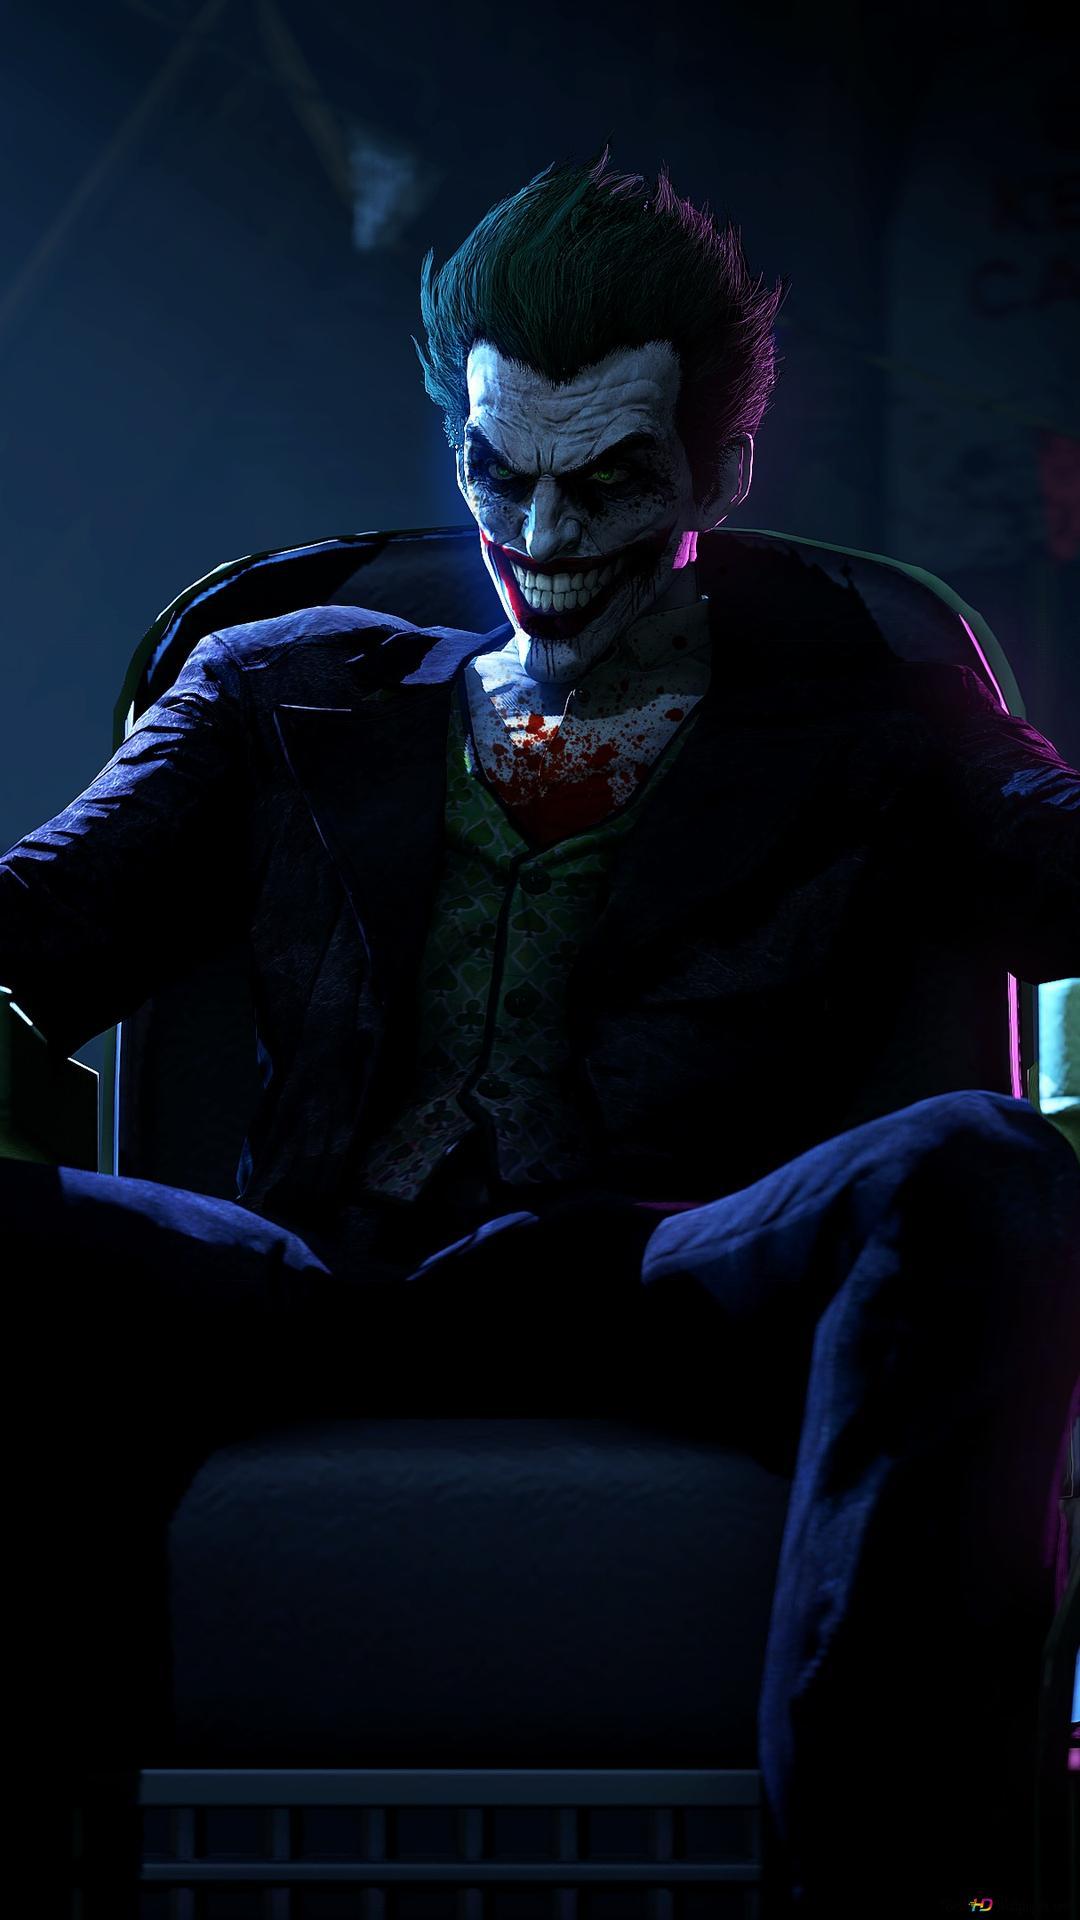 Batman Arkham Origins Joker Hd Wallpaper Download